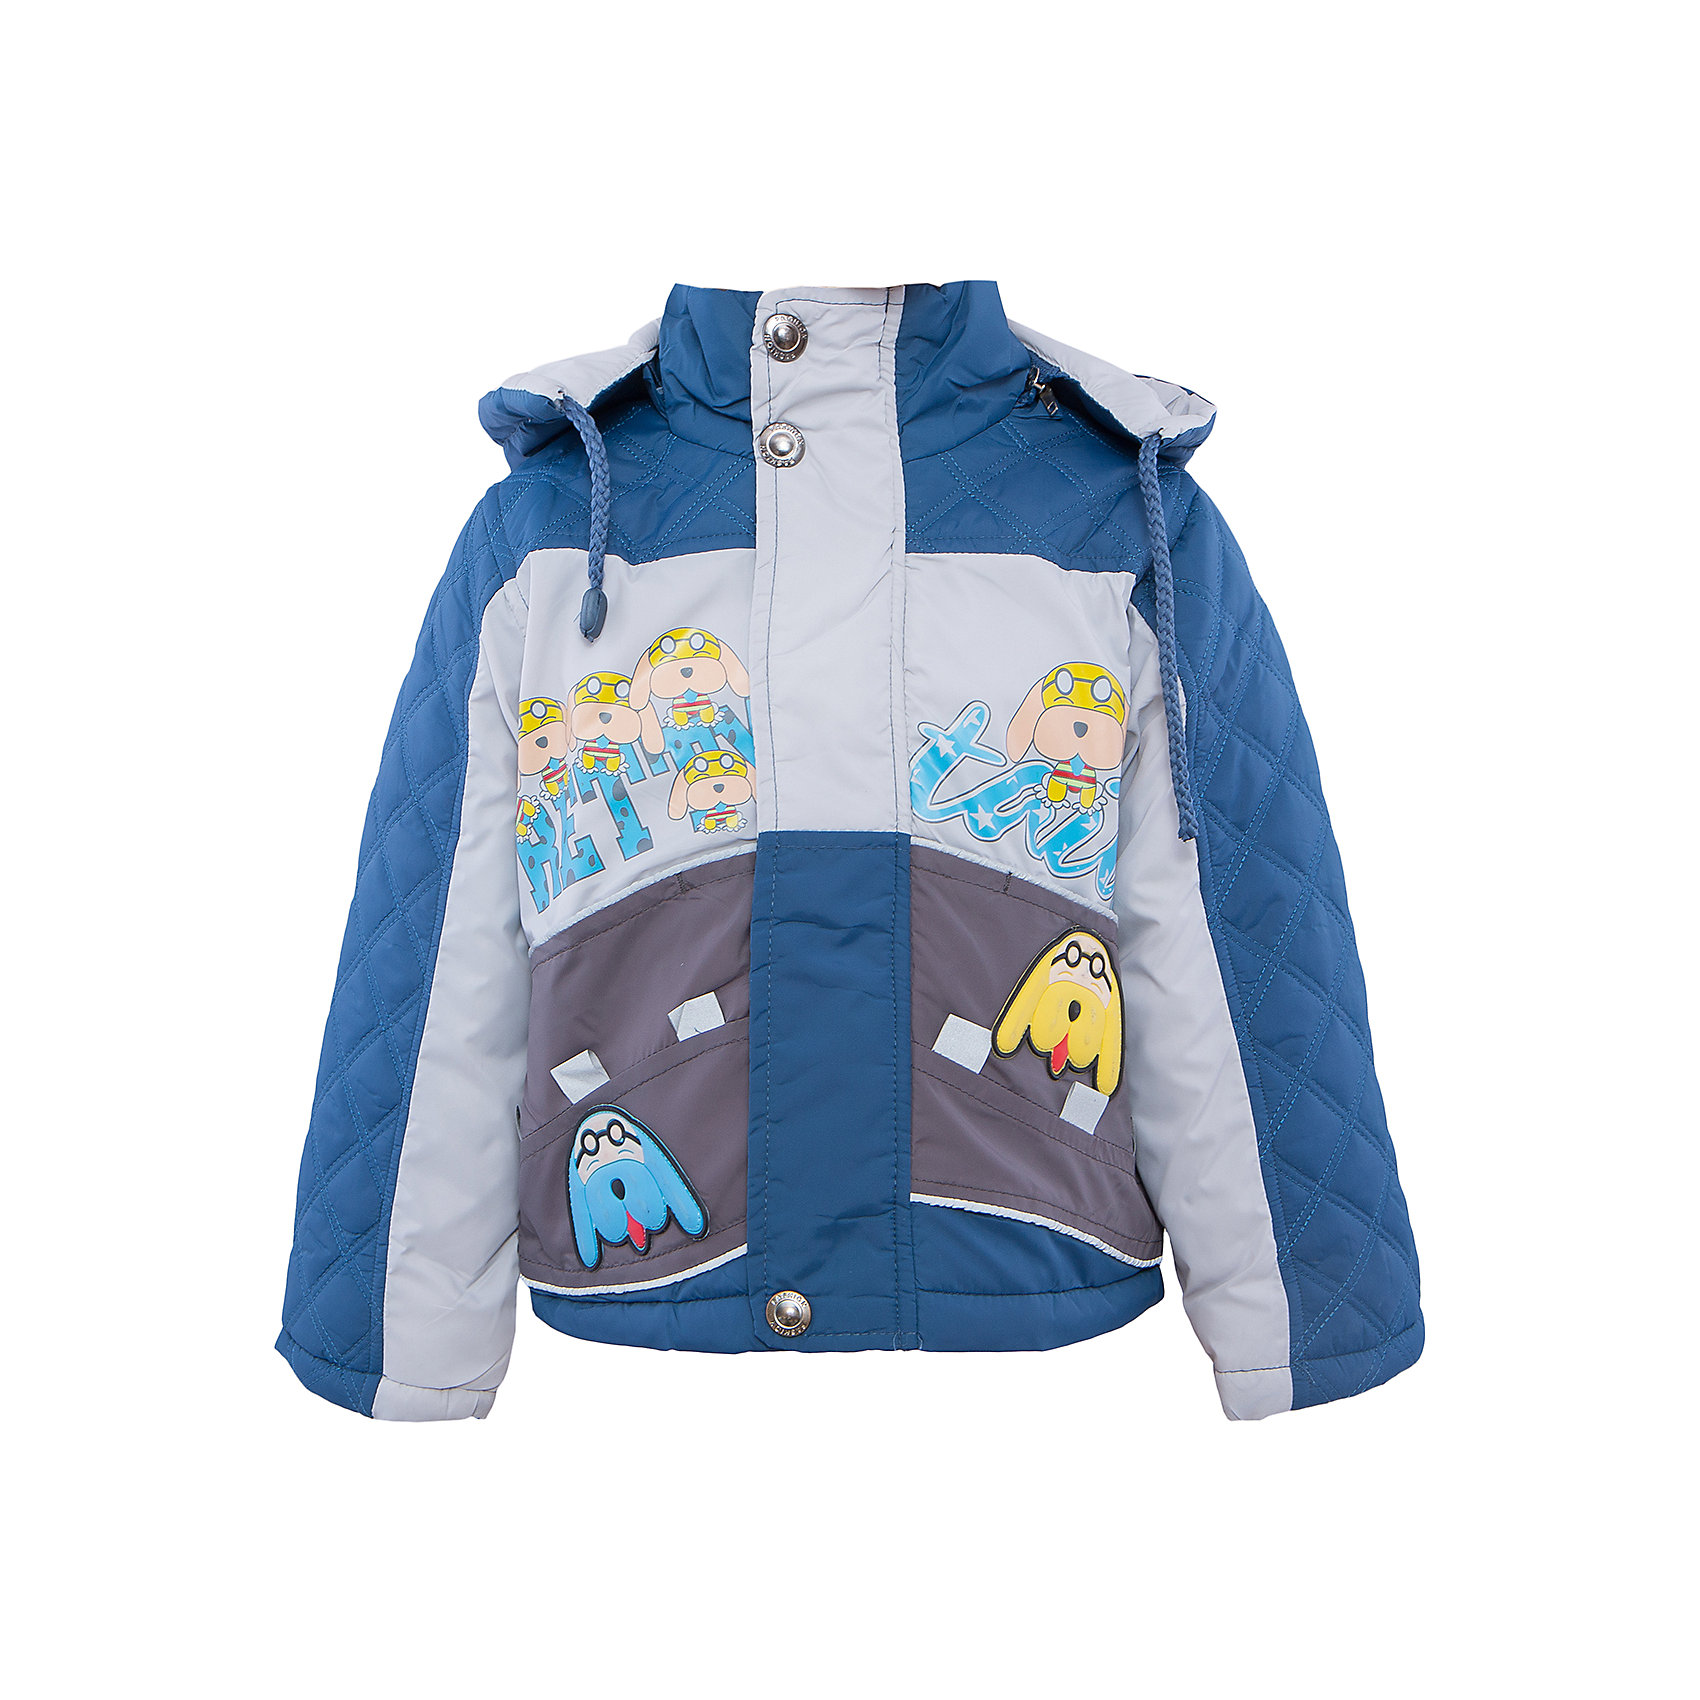 DAUBER Куртка для мальчика DAUBER trybeyond куртка для мальчика 999 77495 00 94z серый trybeyond page 7